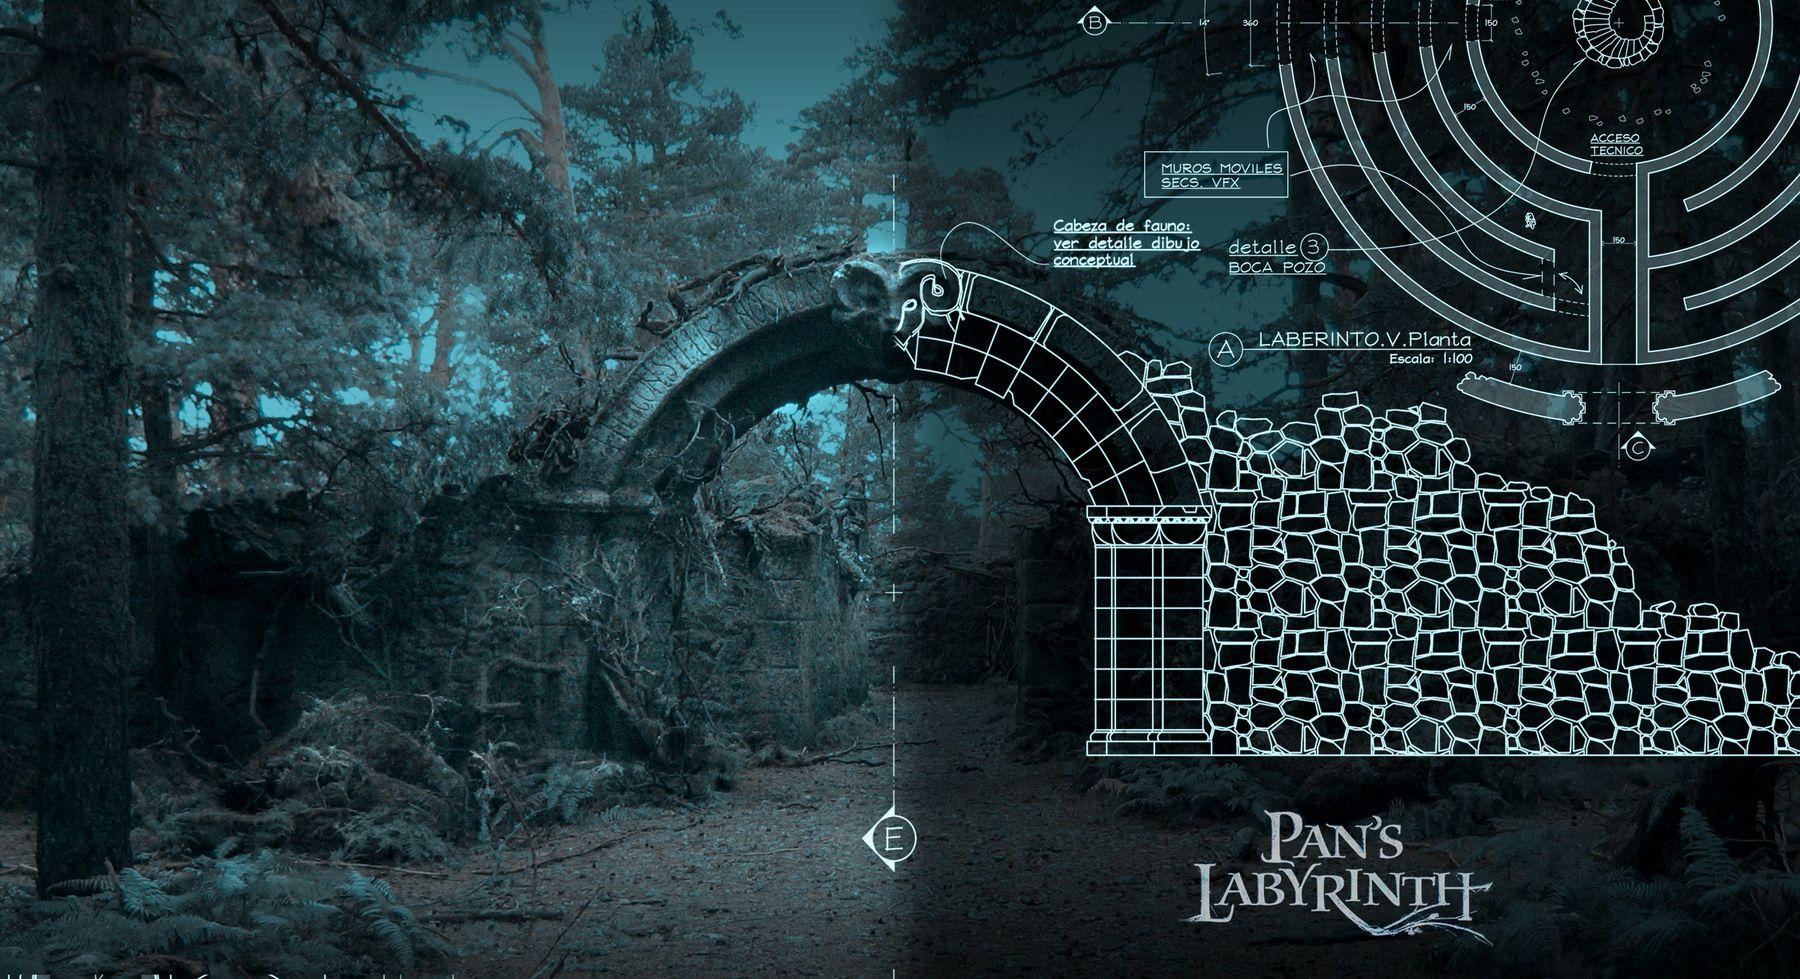 Pans Labyrinth Art Designer